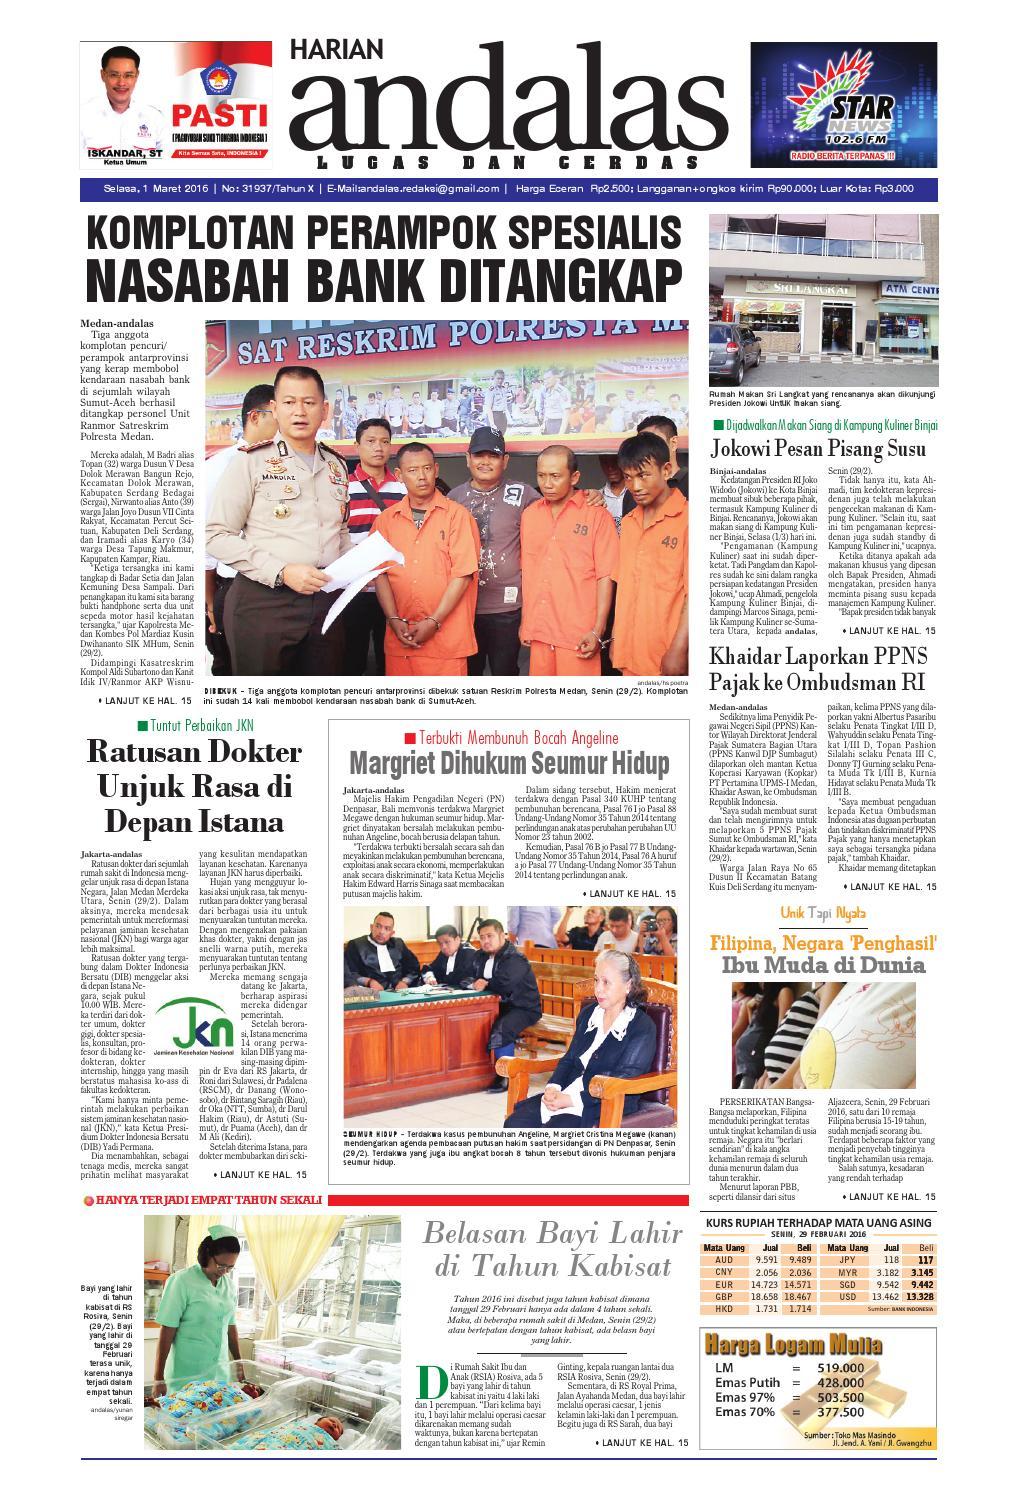 Epaper andalas edisi selasa 1 maret 2016 by media andalas - issuu 30e27b54ff